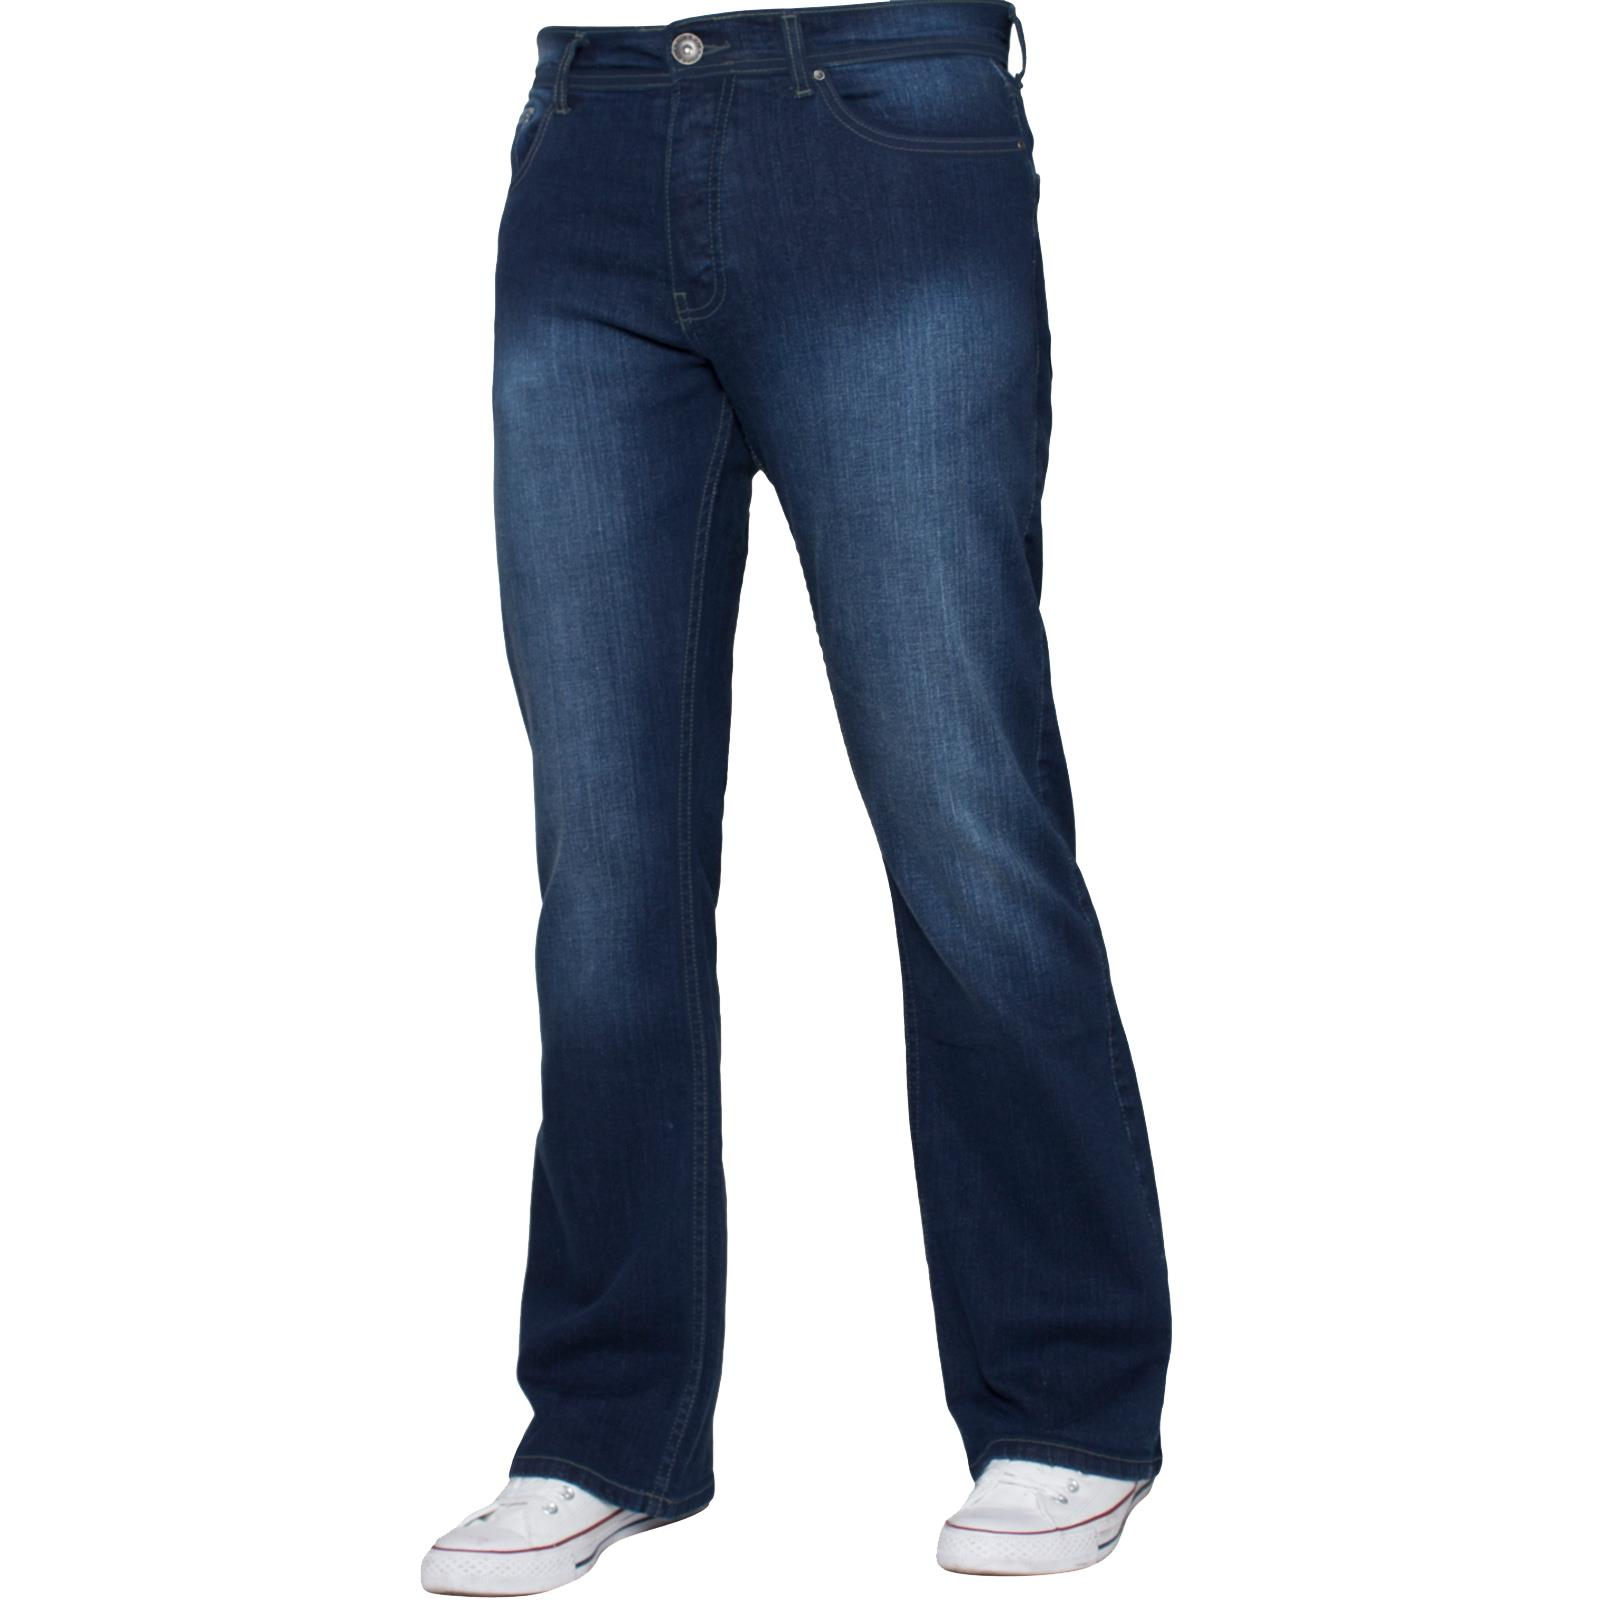 ENZO-Jeans-para-hombre-Big-Alto-Pierna-King-Size-Jeans-Pantalones-Chino-Pantalones-Pantalones-44-034 miniatura 113